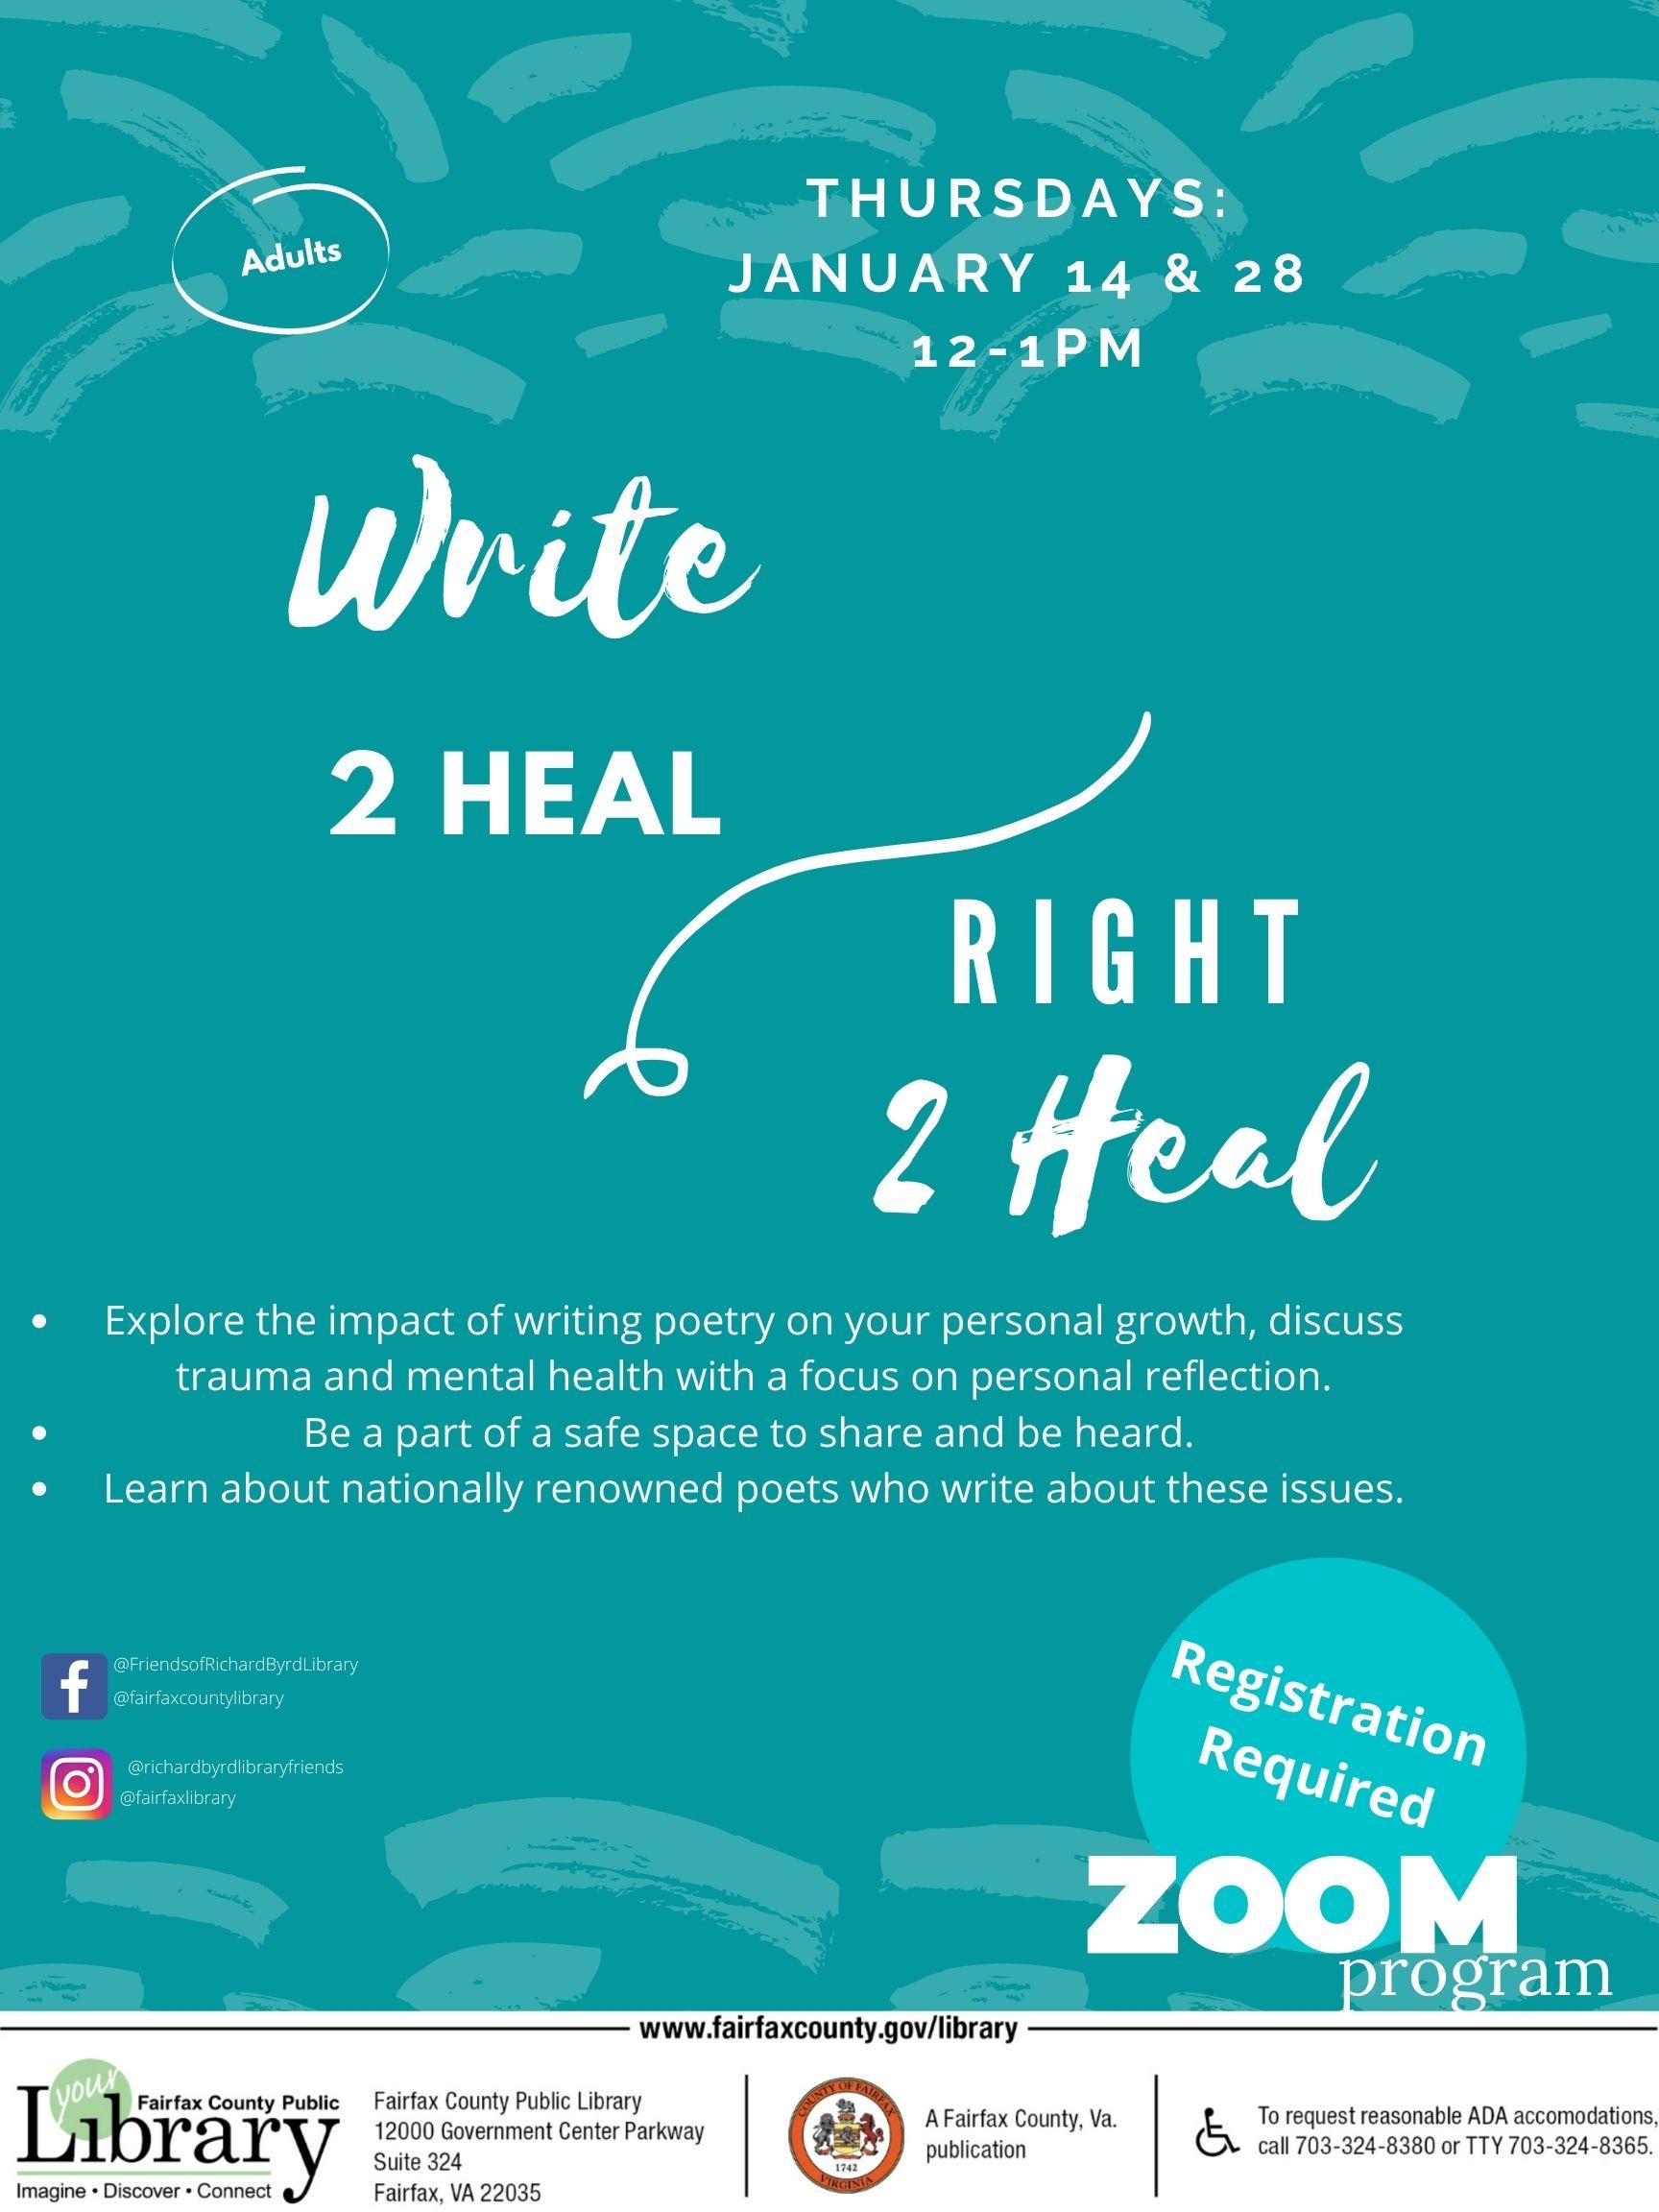 Write 2heal / Right 2heal